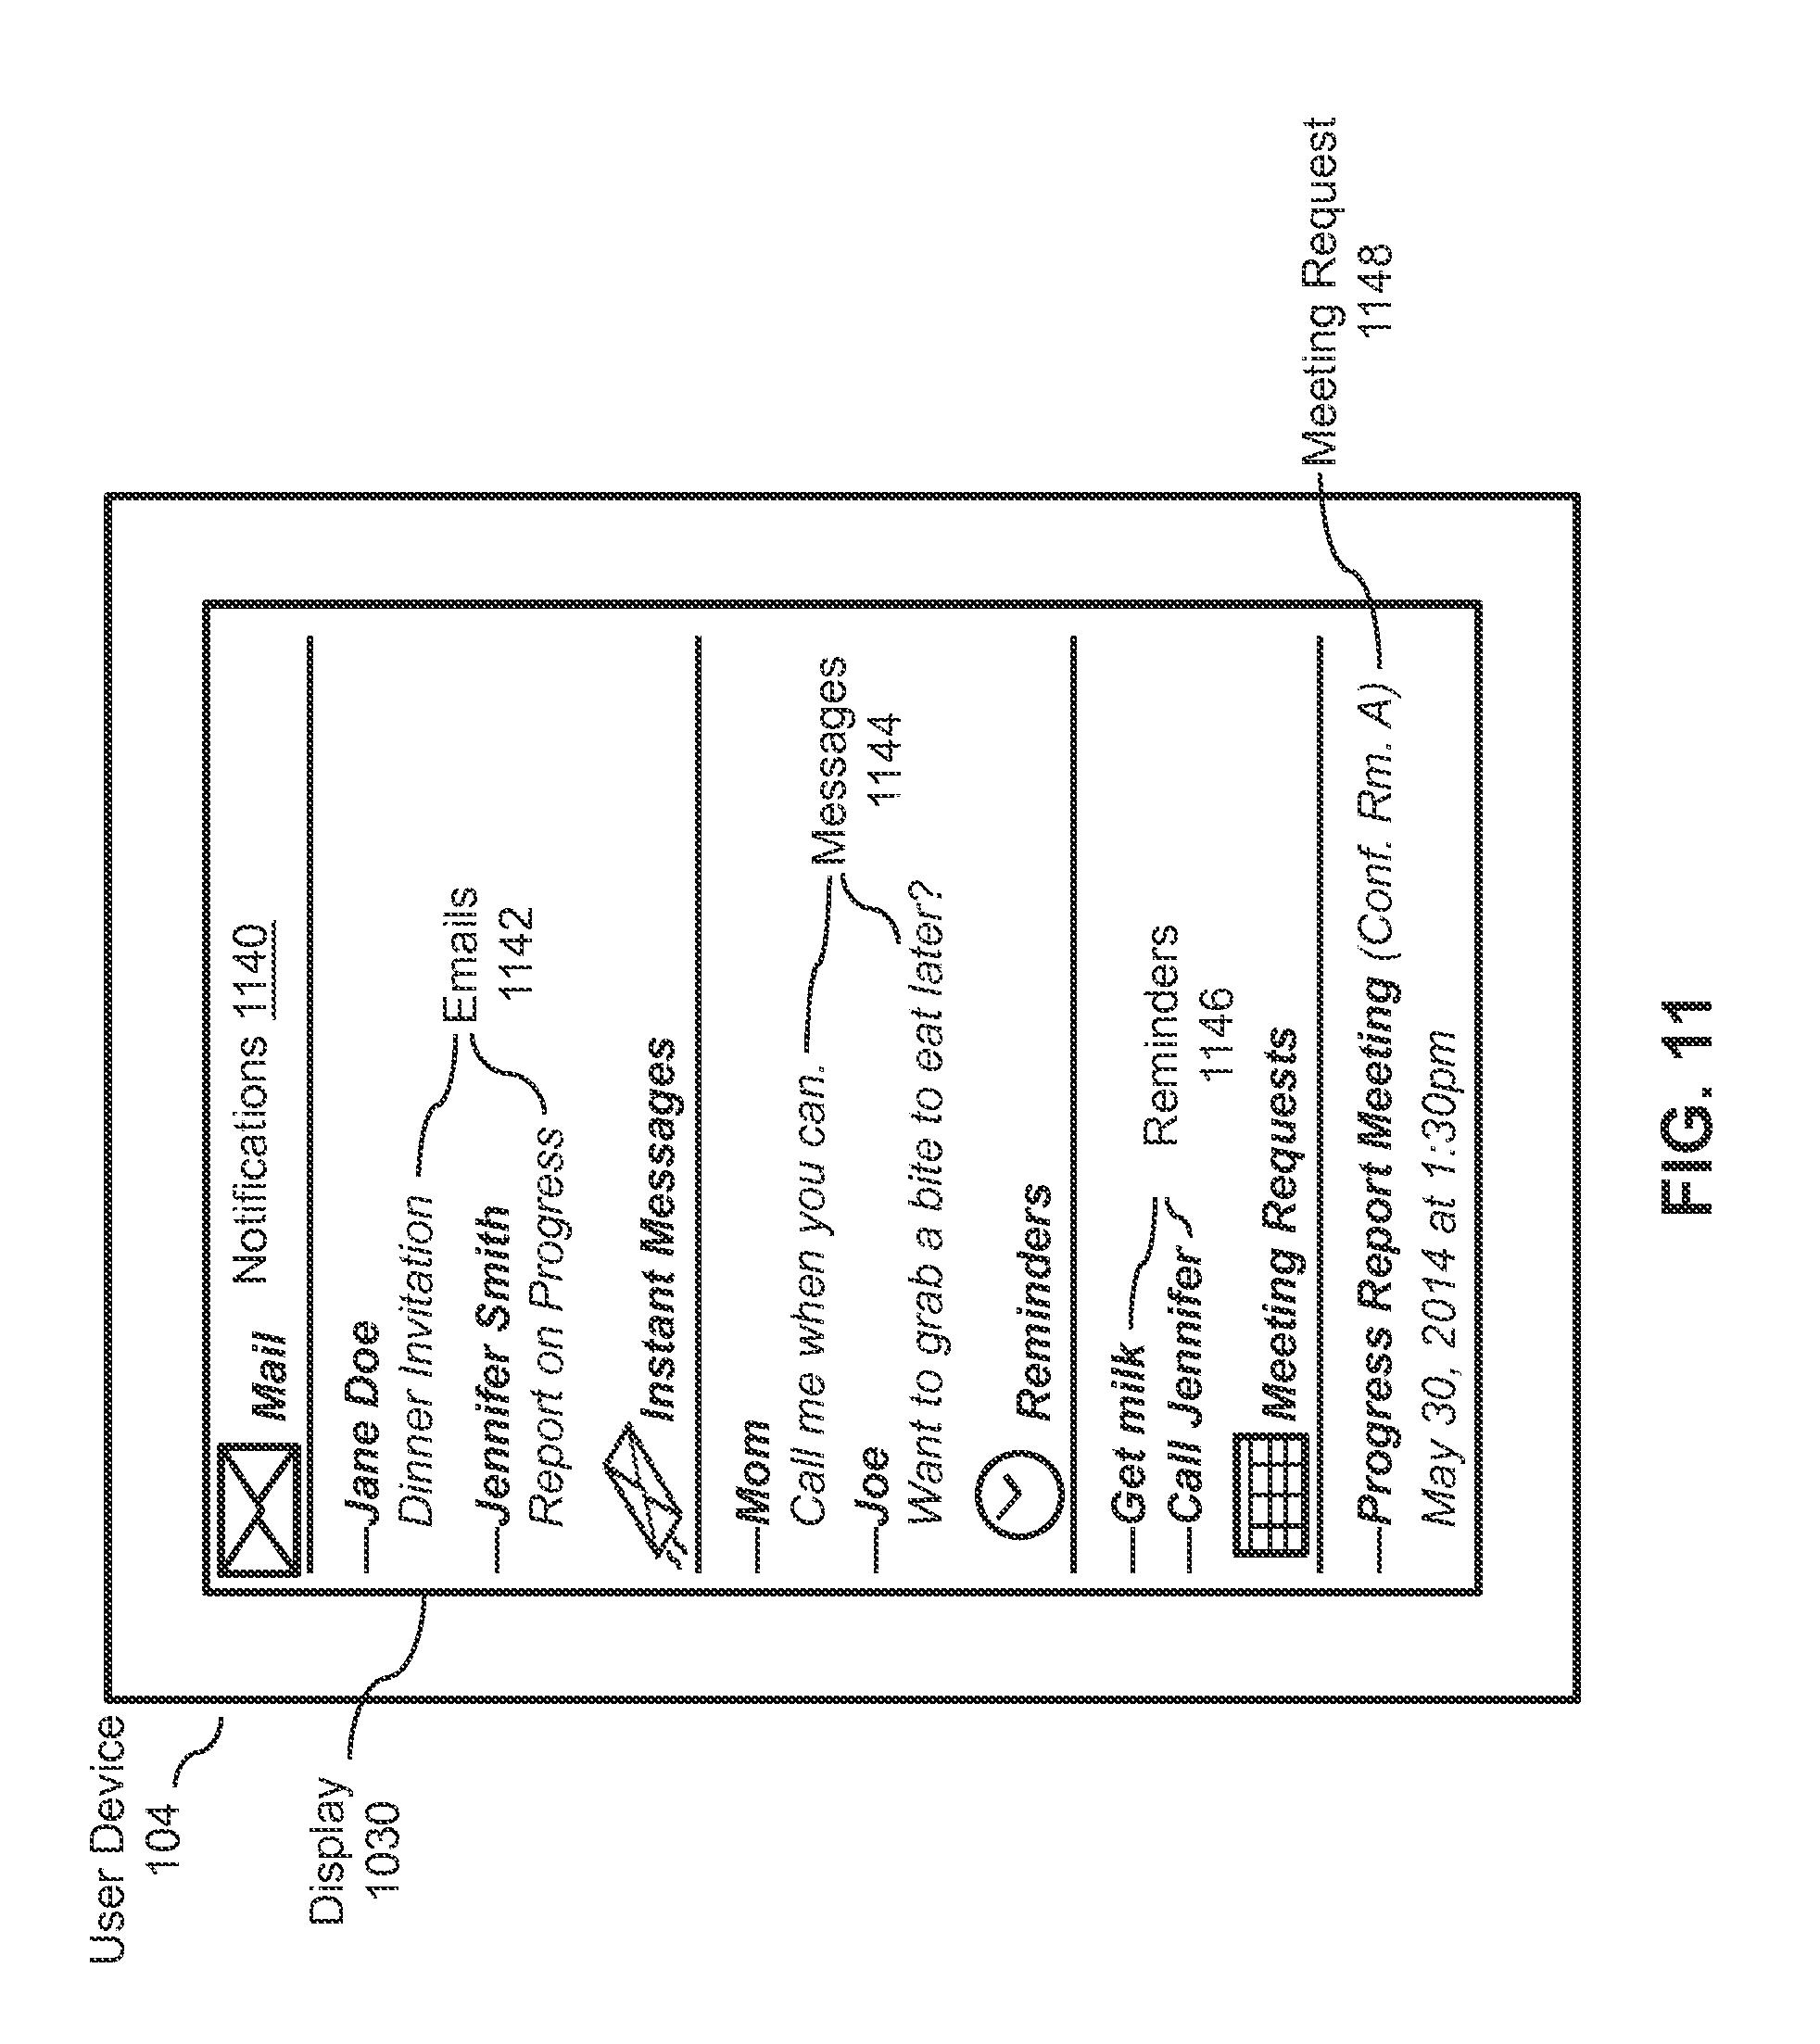 Patent US 9,966,065 B2